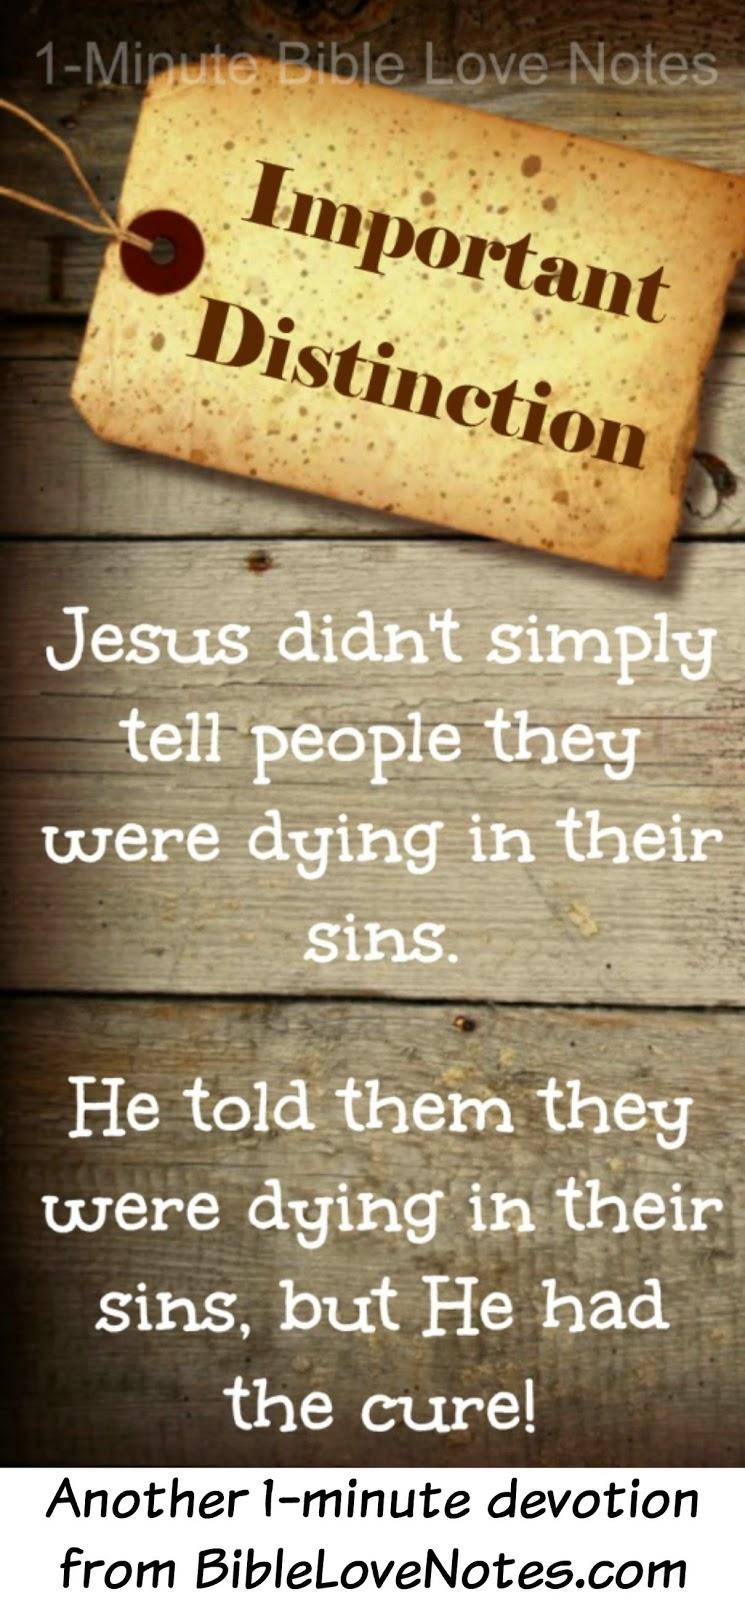 John 3:17, Judgment, Do Not Judge Misunderstandings